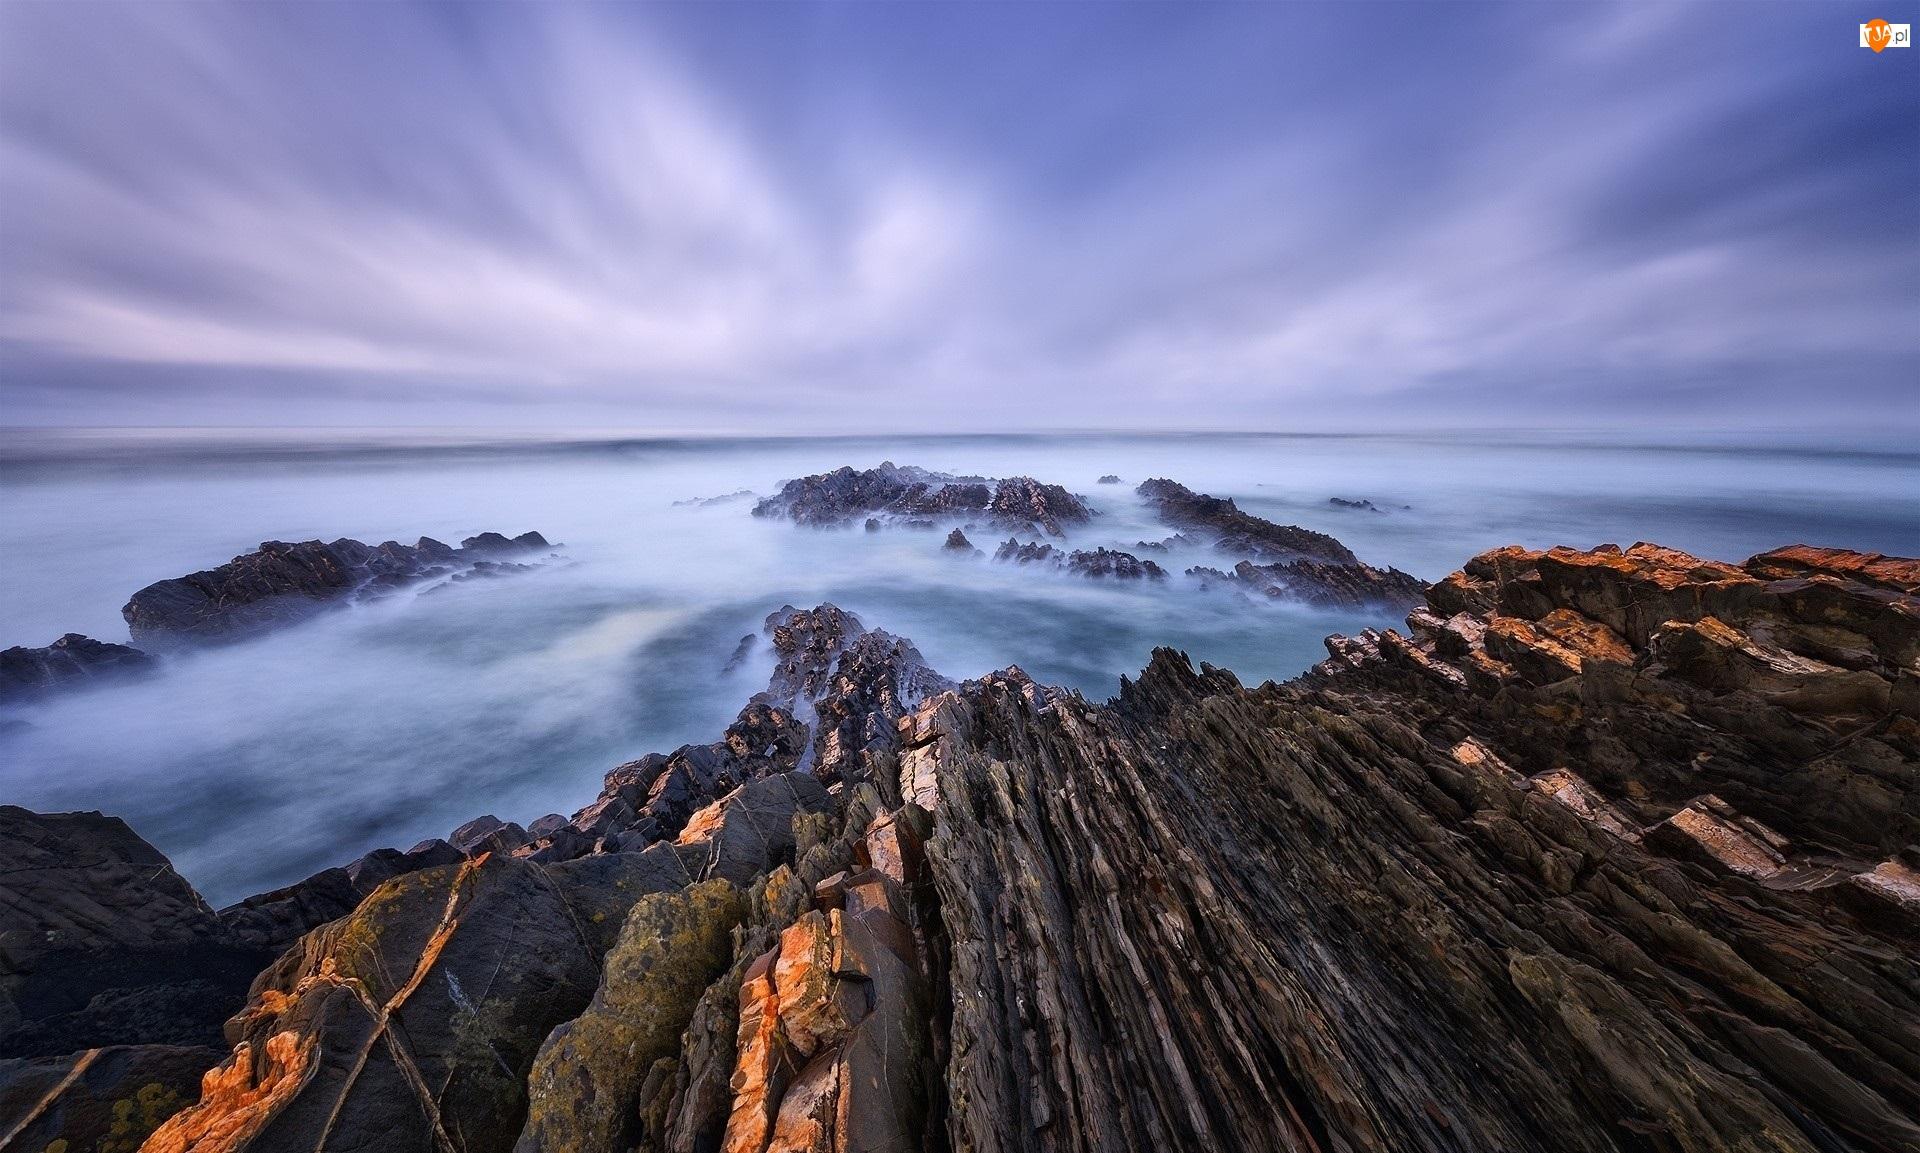 Kamienie, Portugalia, Ocean Atlantycki, Almograve, Morze